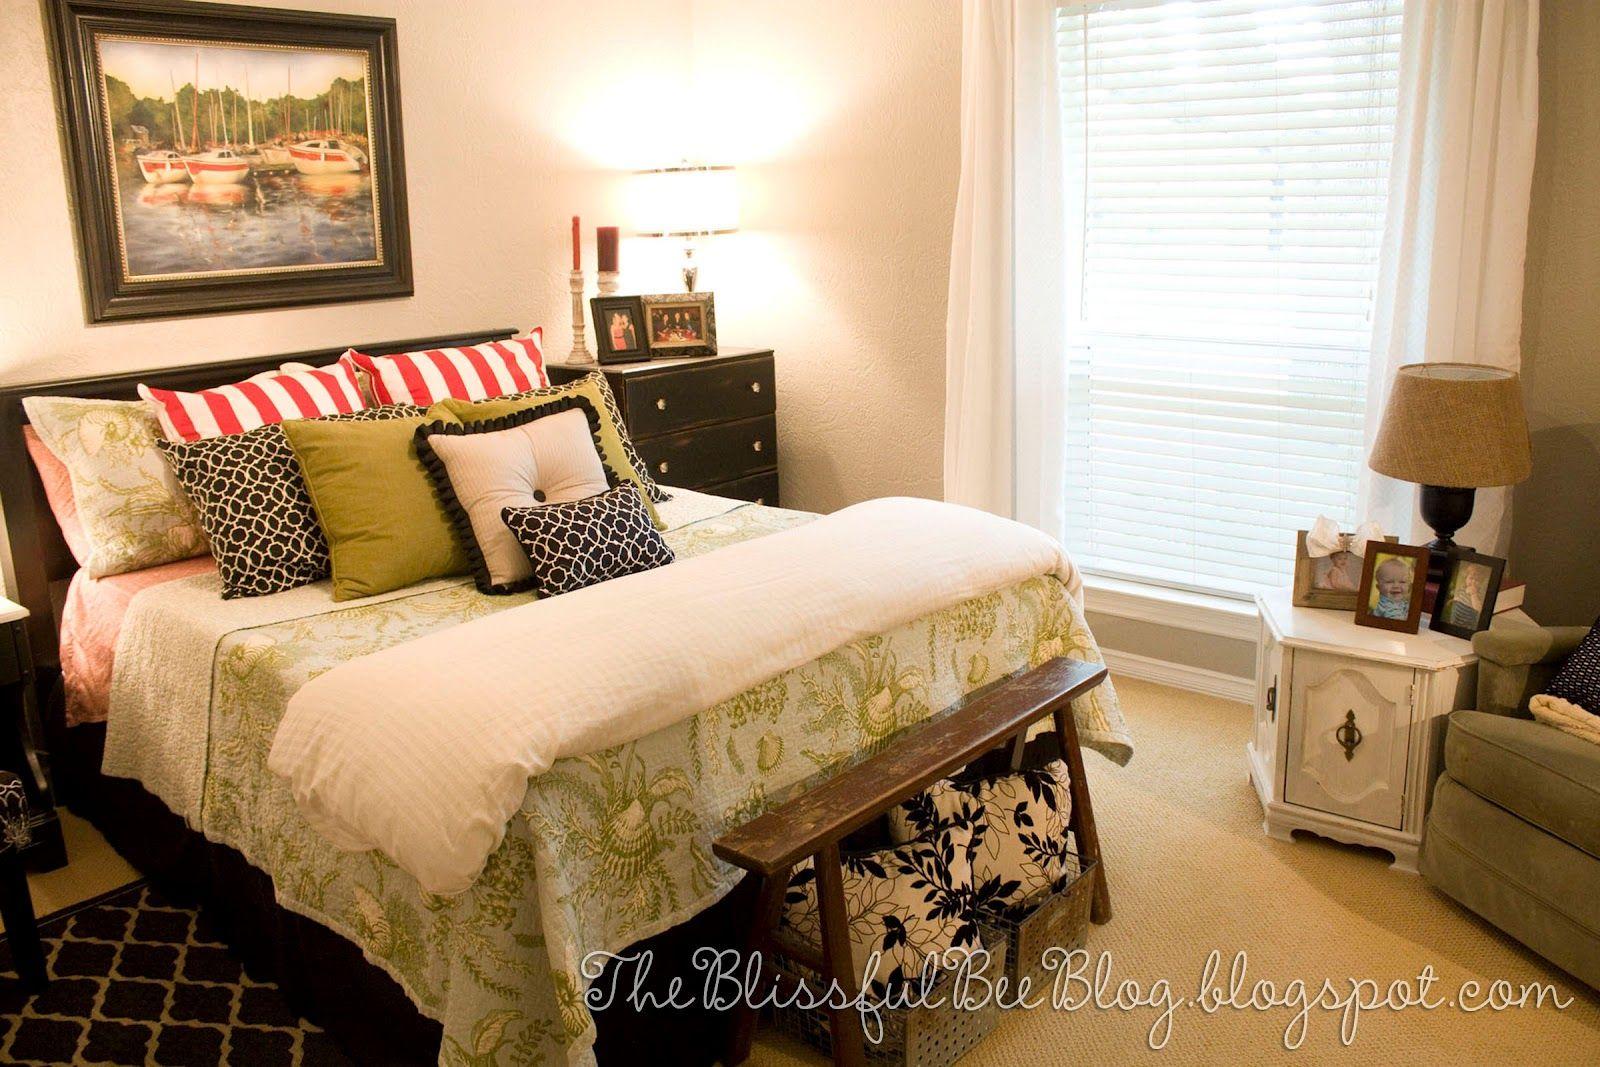 Bedding | Home, Home decor, Bedroom inspirations